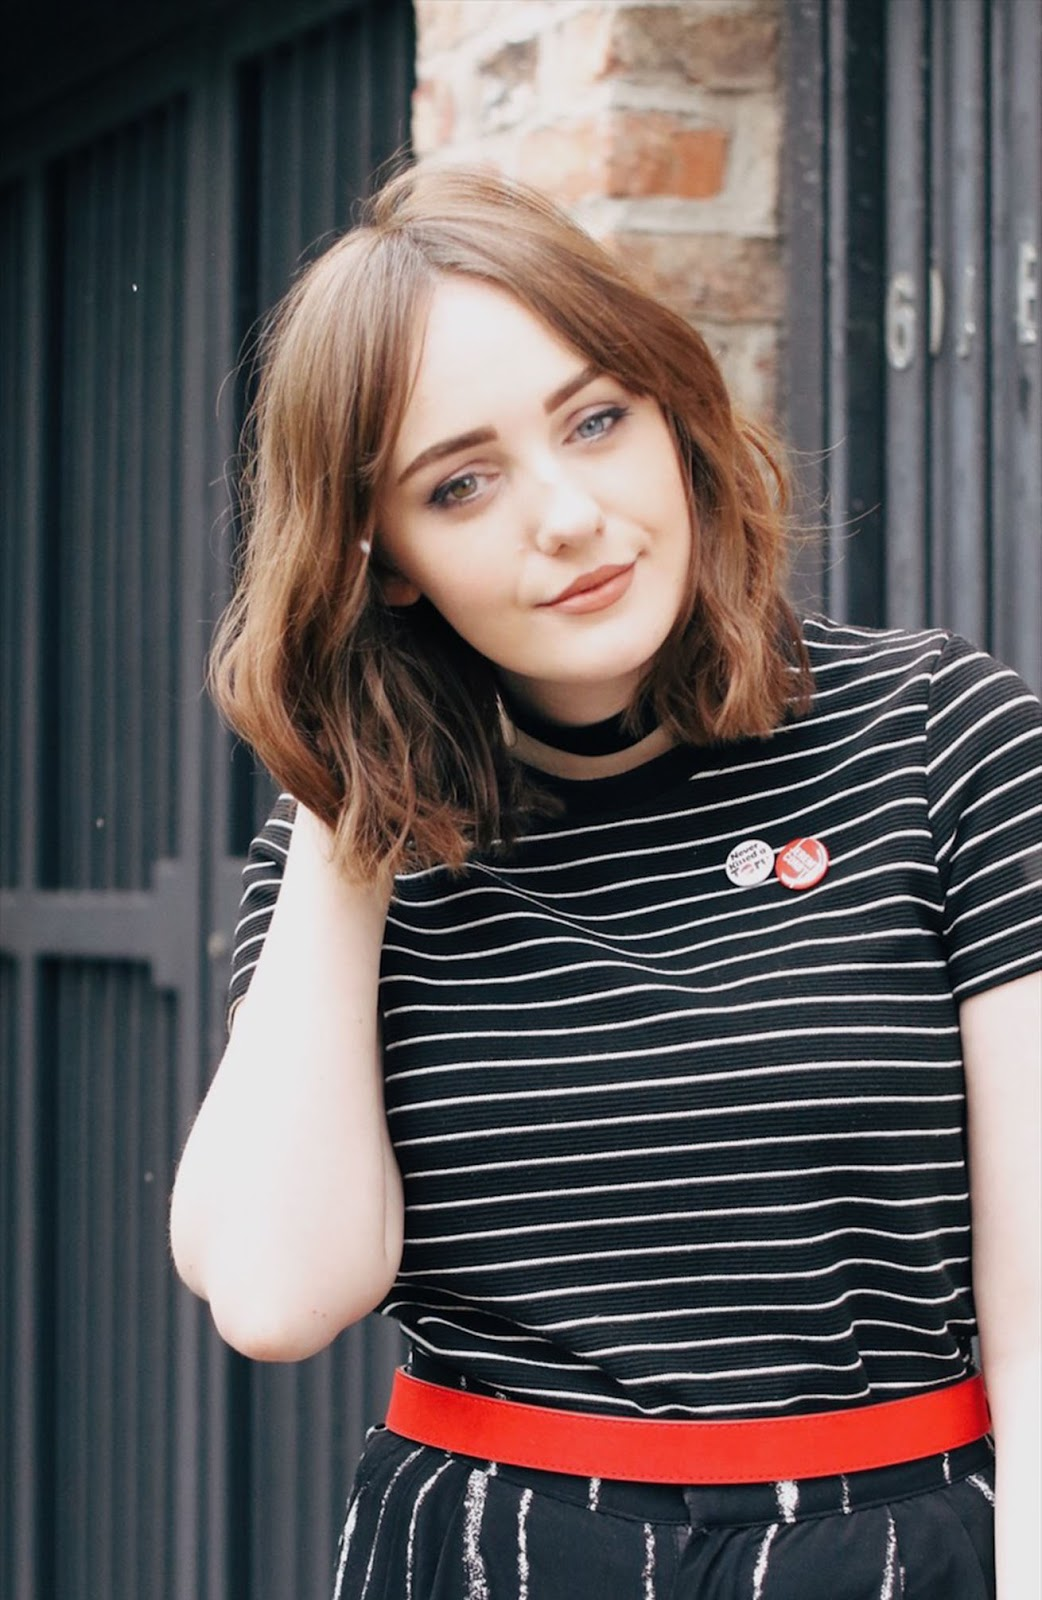 Liverpool fashion blogger